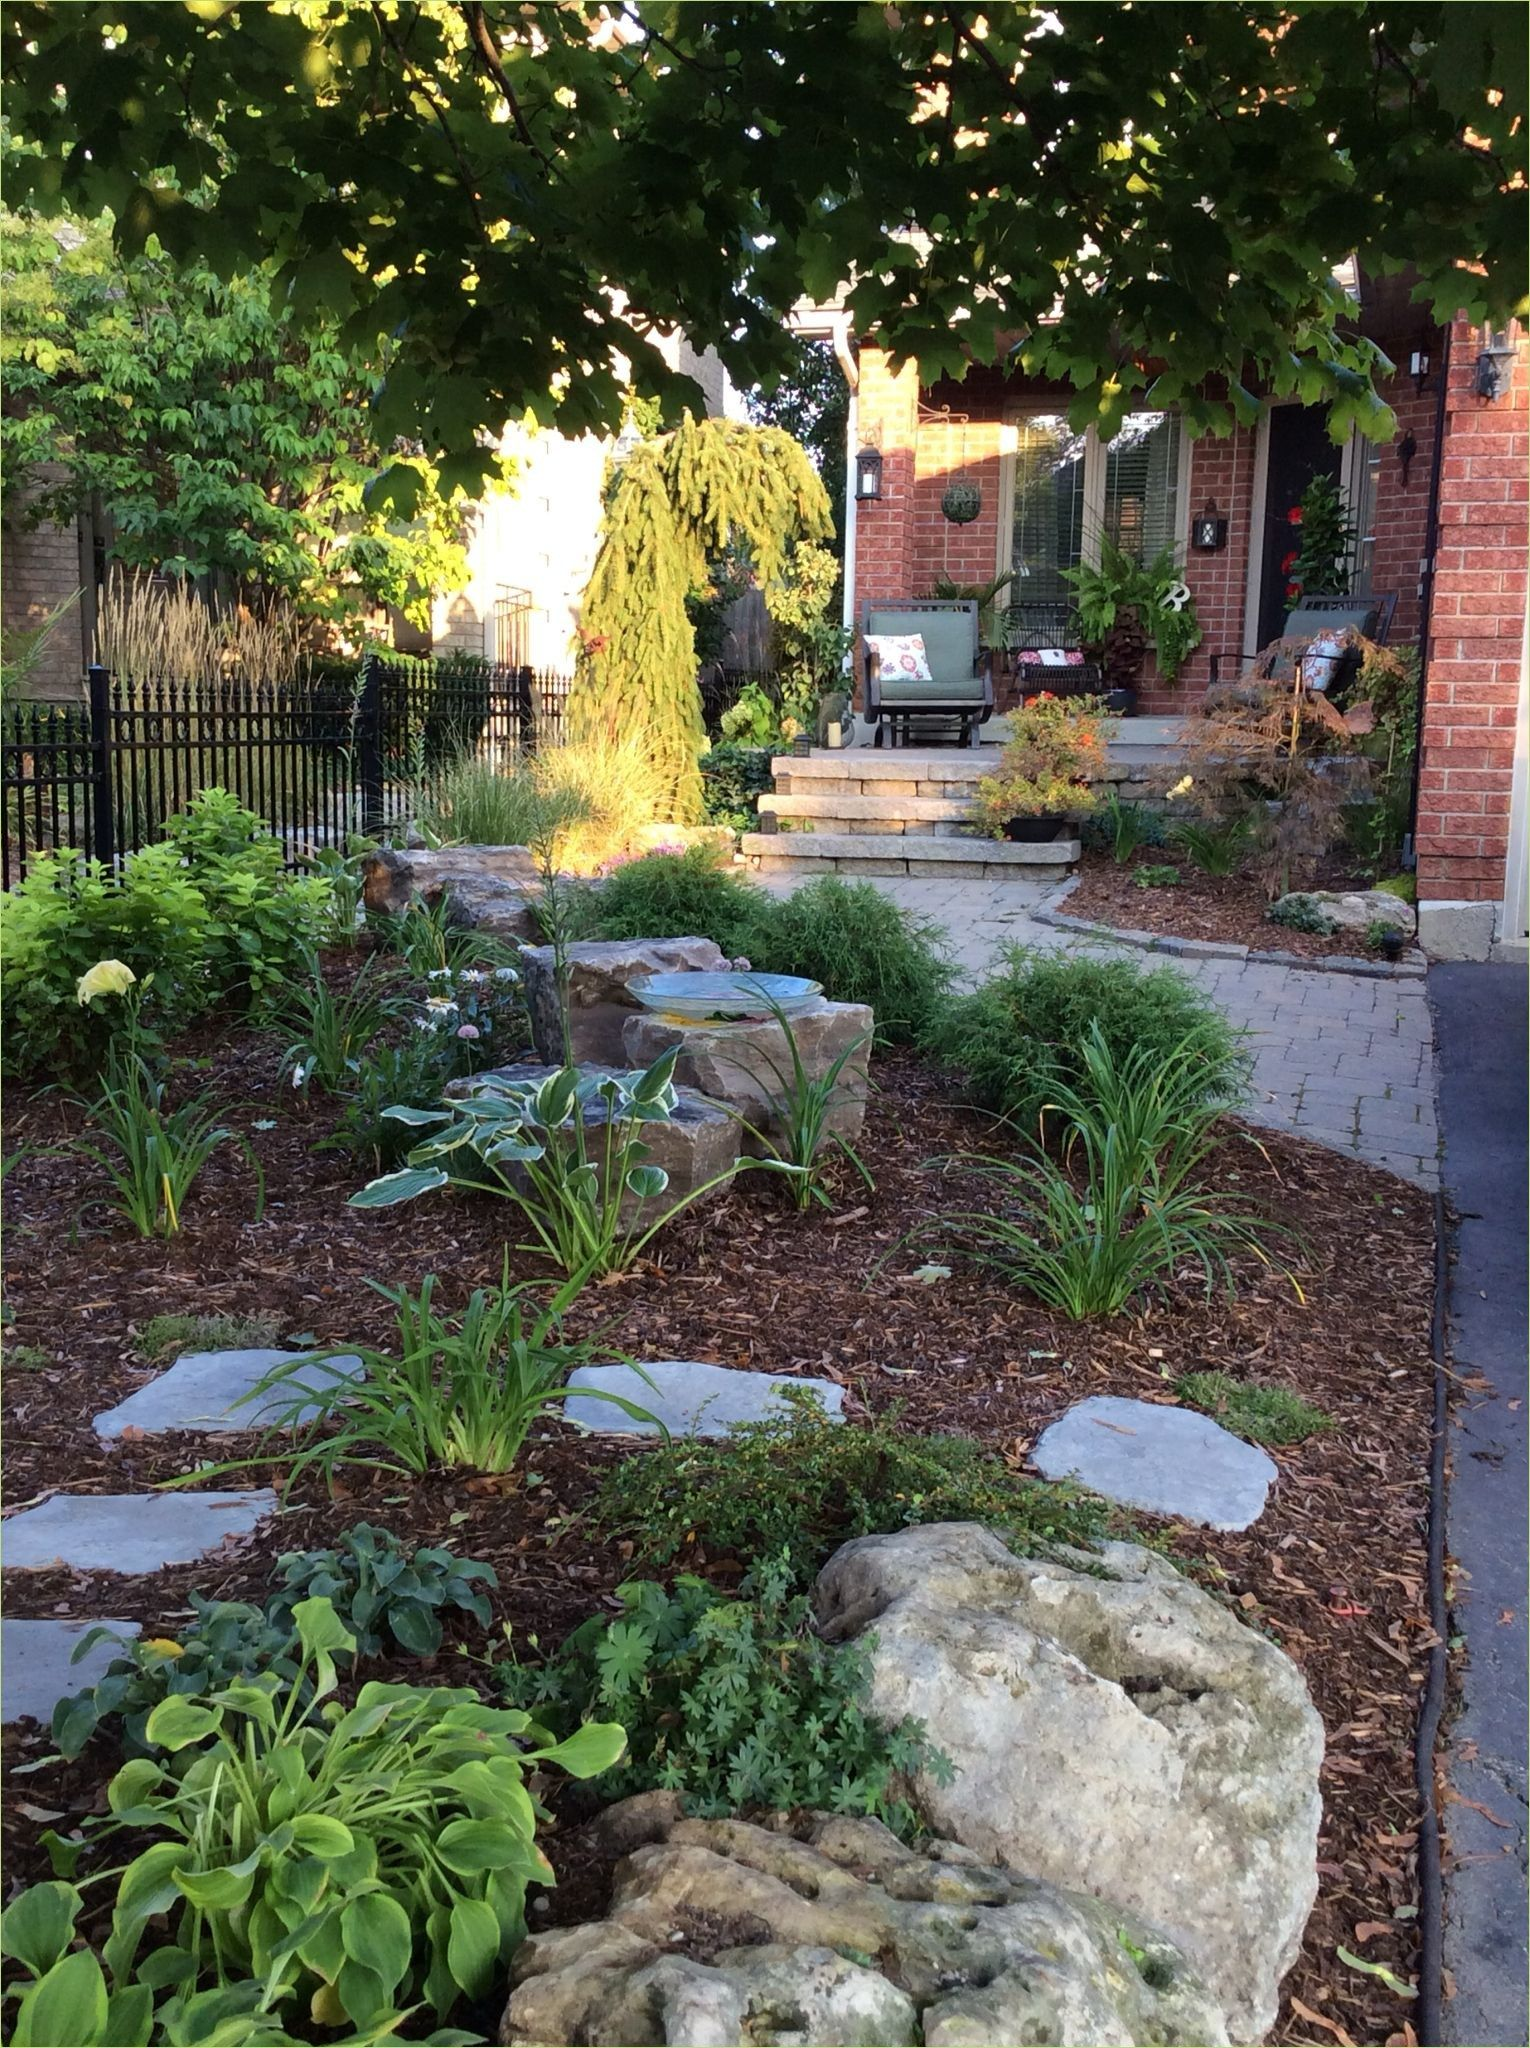 Fantastic Front Yard Landscaping Ideas No Grass | Small ... on Small Backyard Ideas No Grass  id=53142